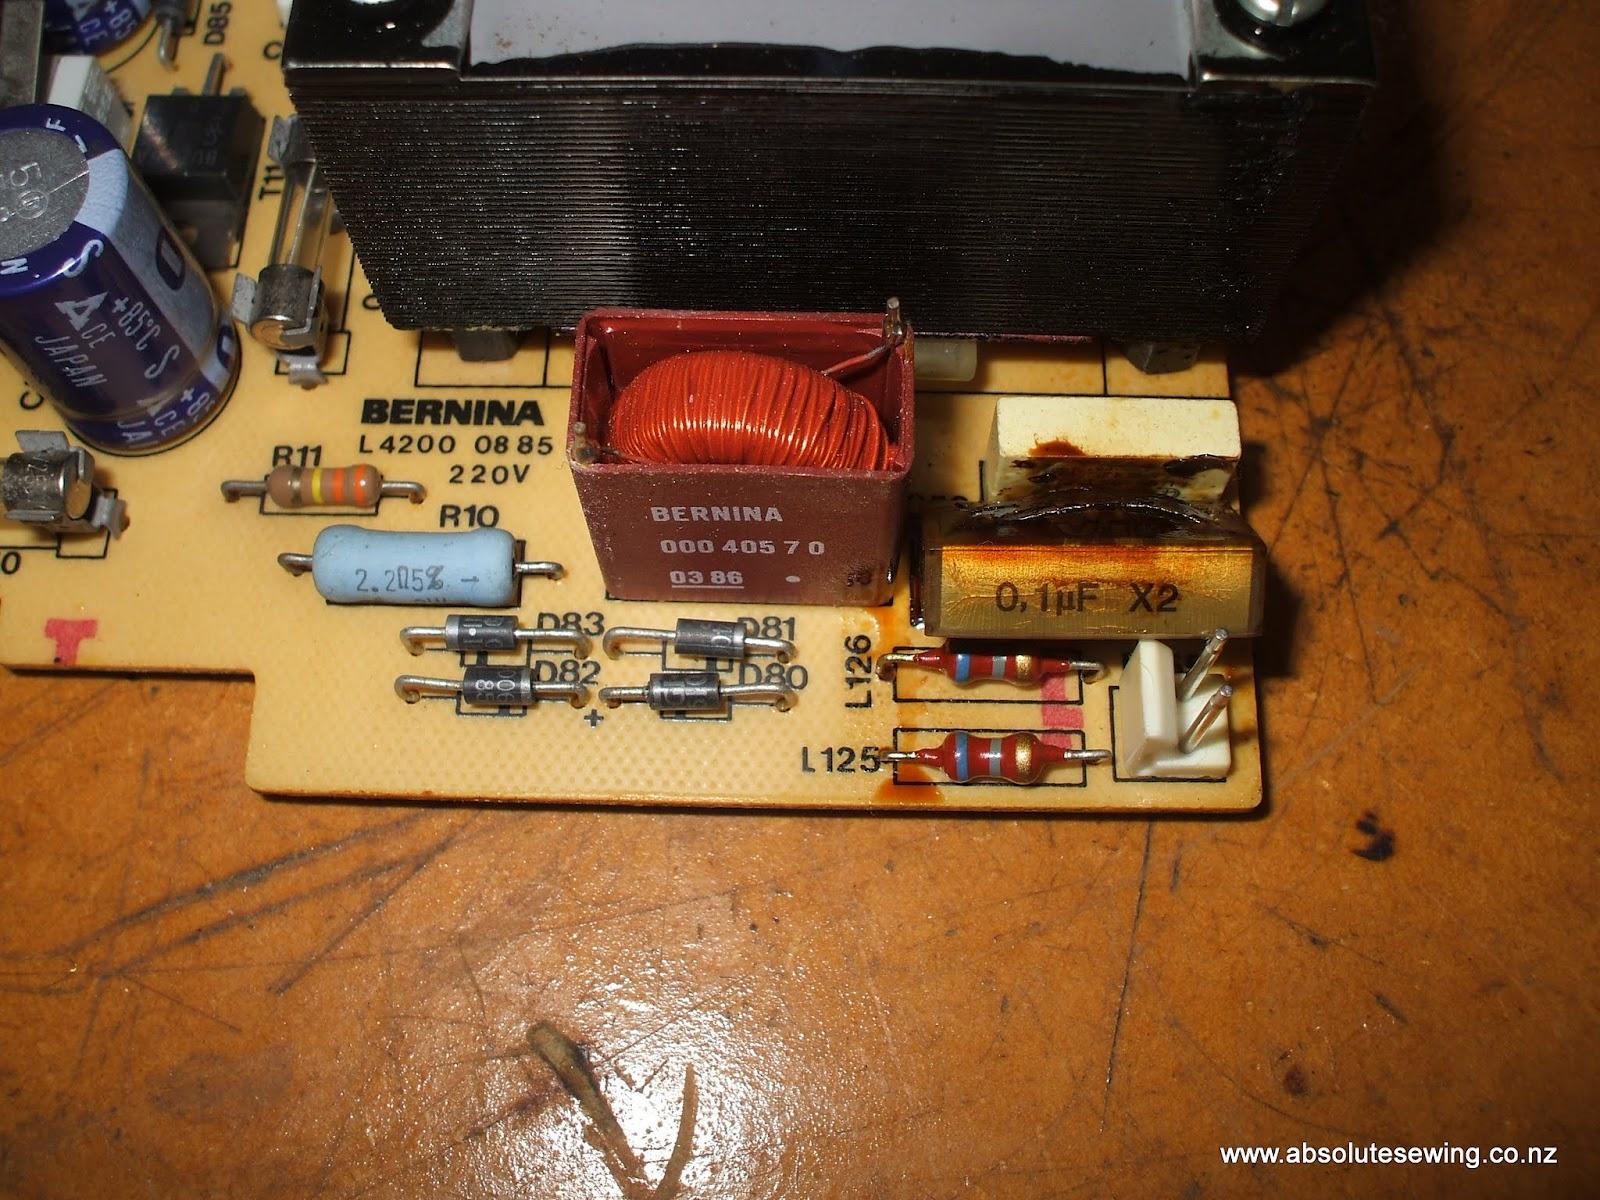 Bernina Sewing Wiring Diagram Not Lossing Sew Diagrams Images Gallery